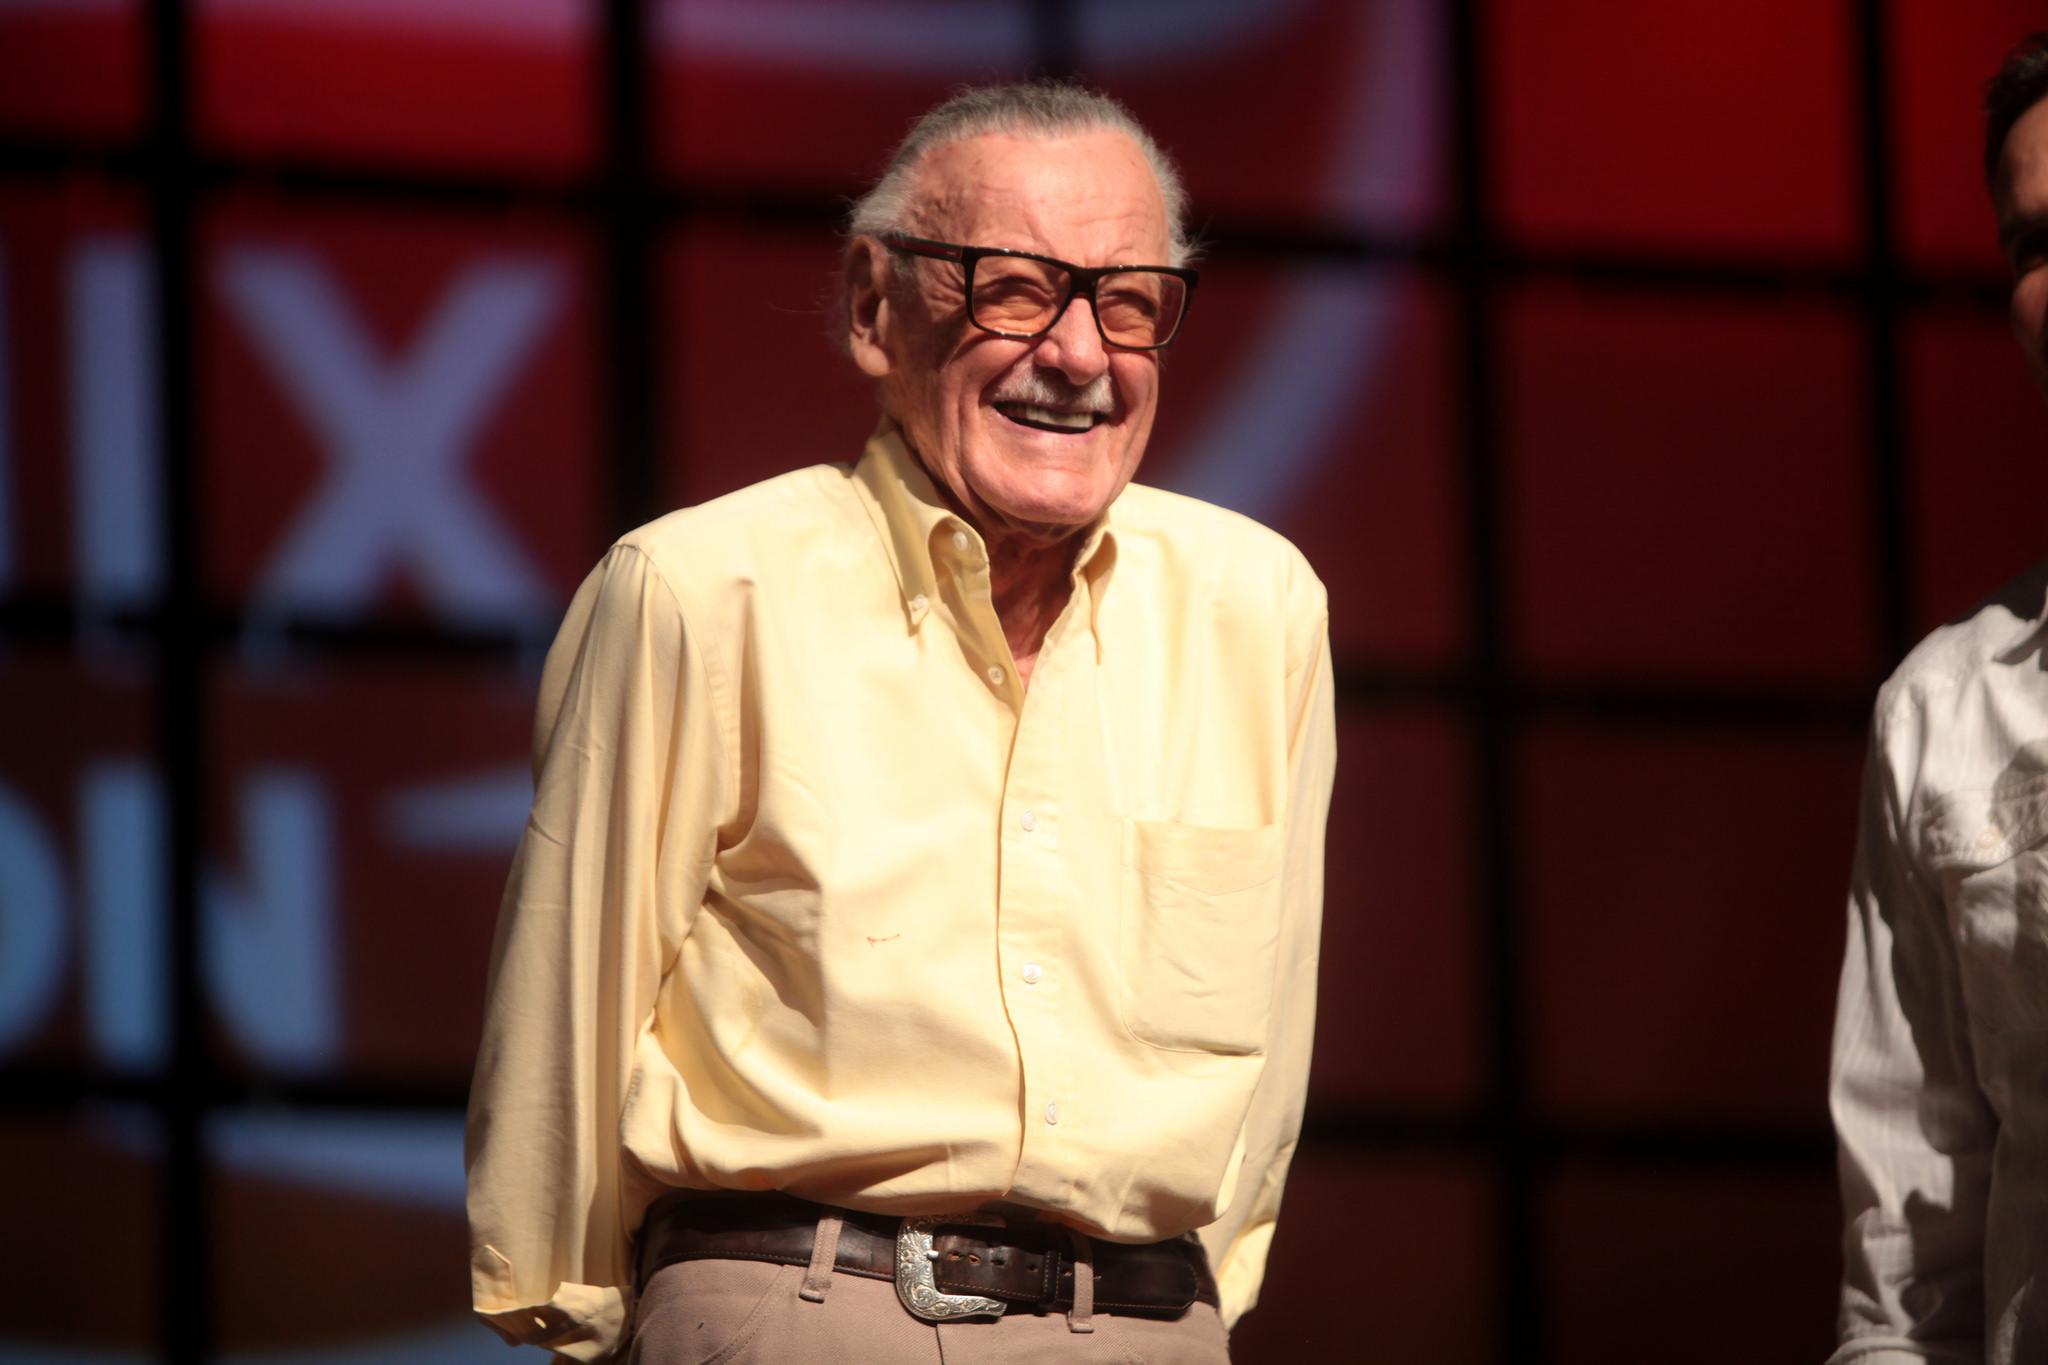 Stan Lee, Comic-Book Legend, Dead at 95